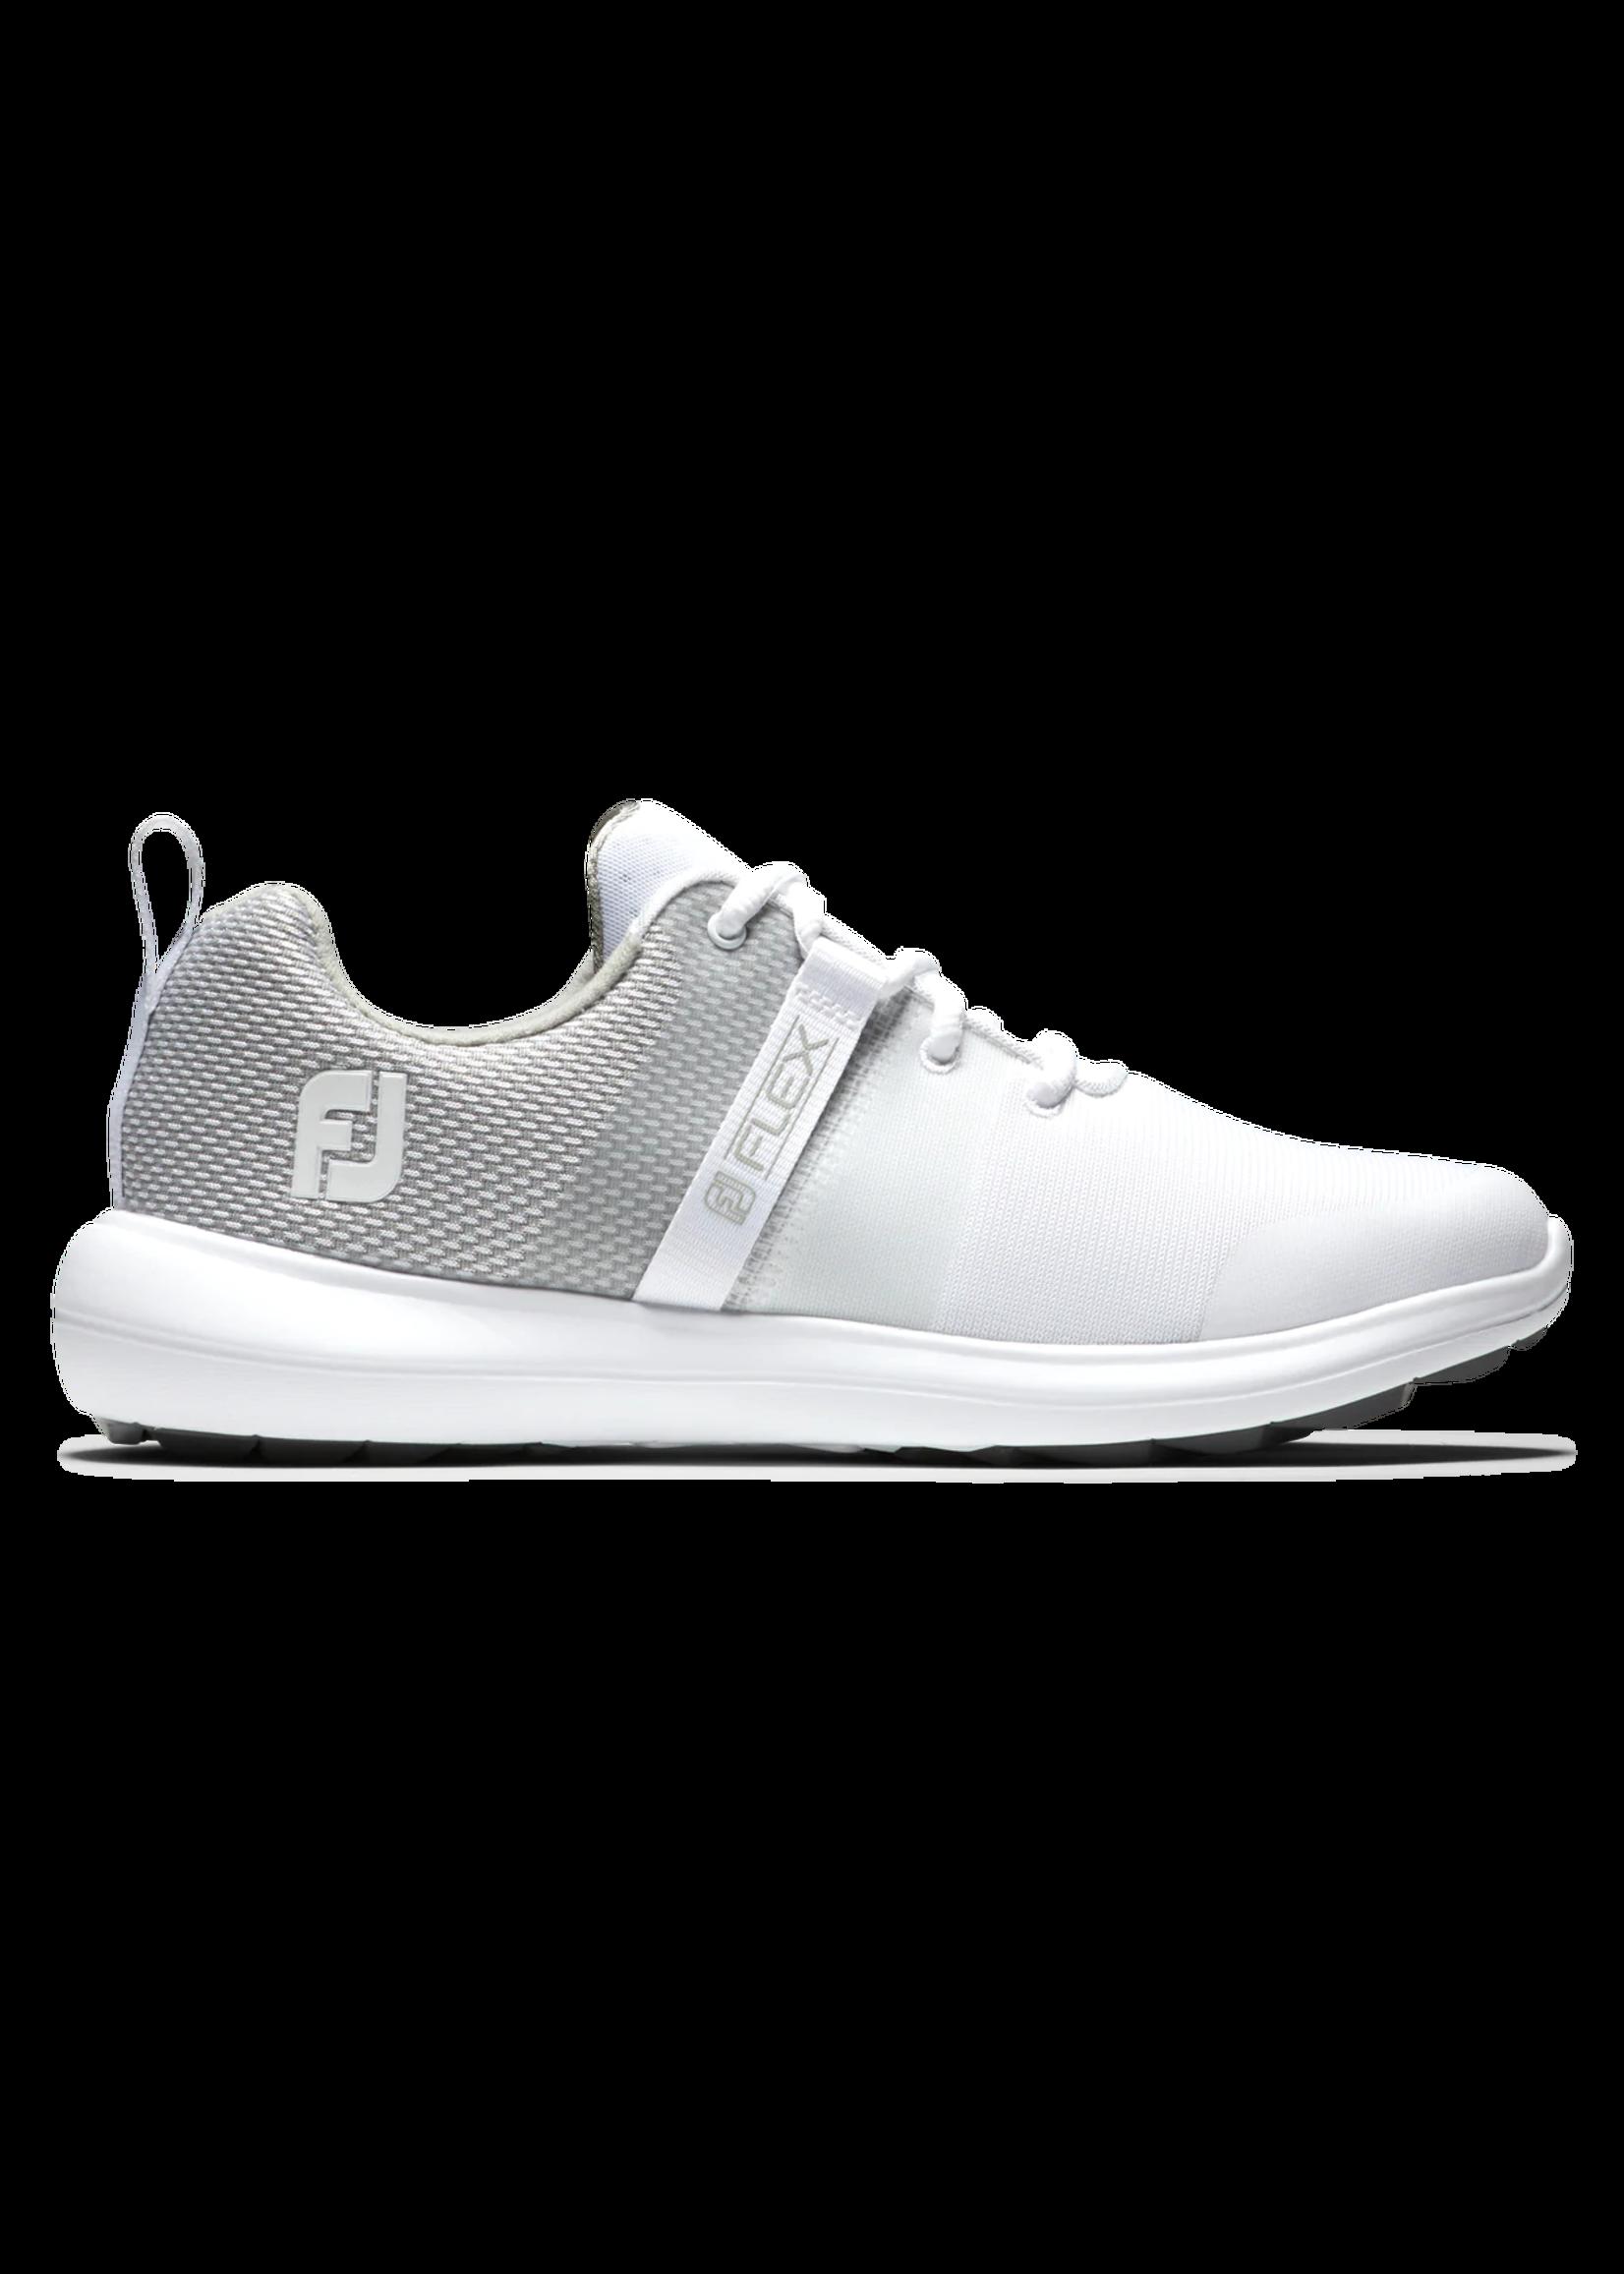 Footjoy - Womens Flex Shoes